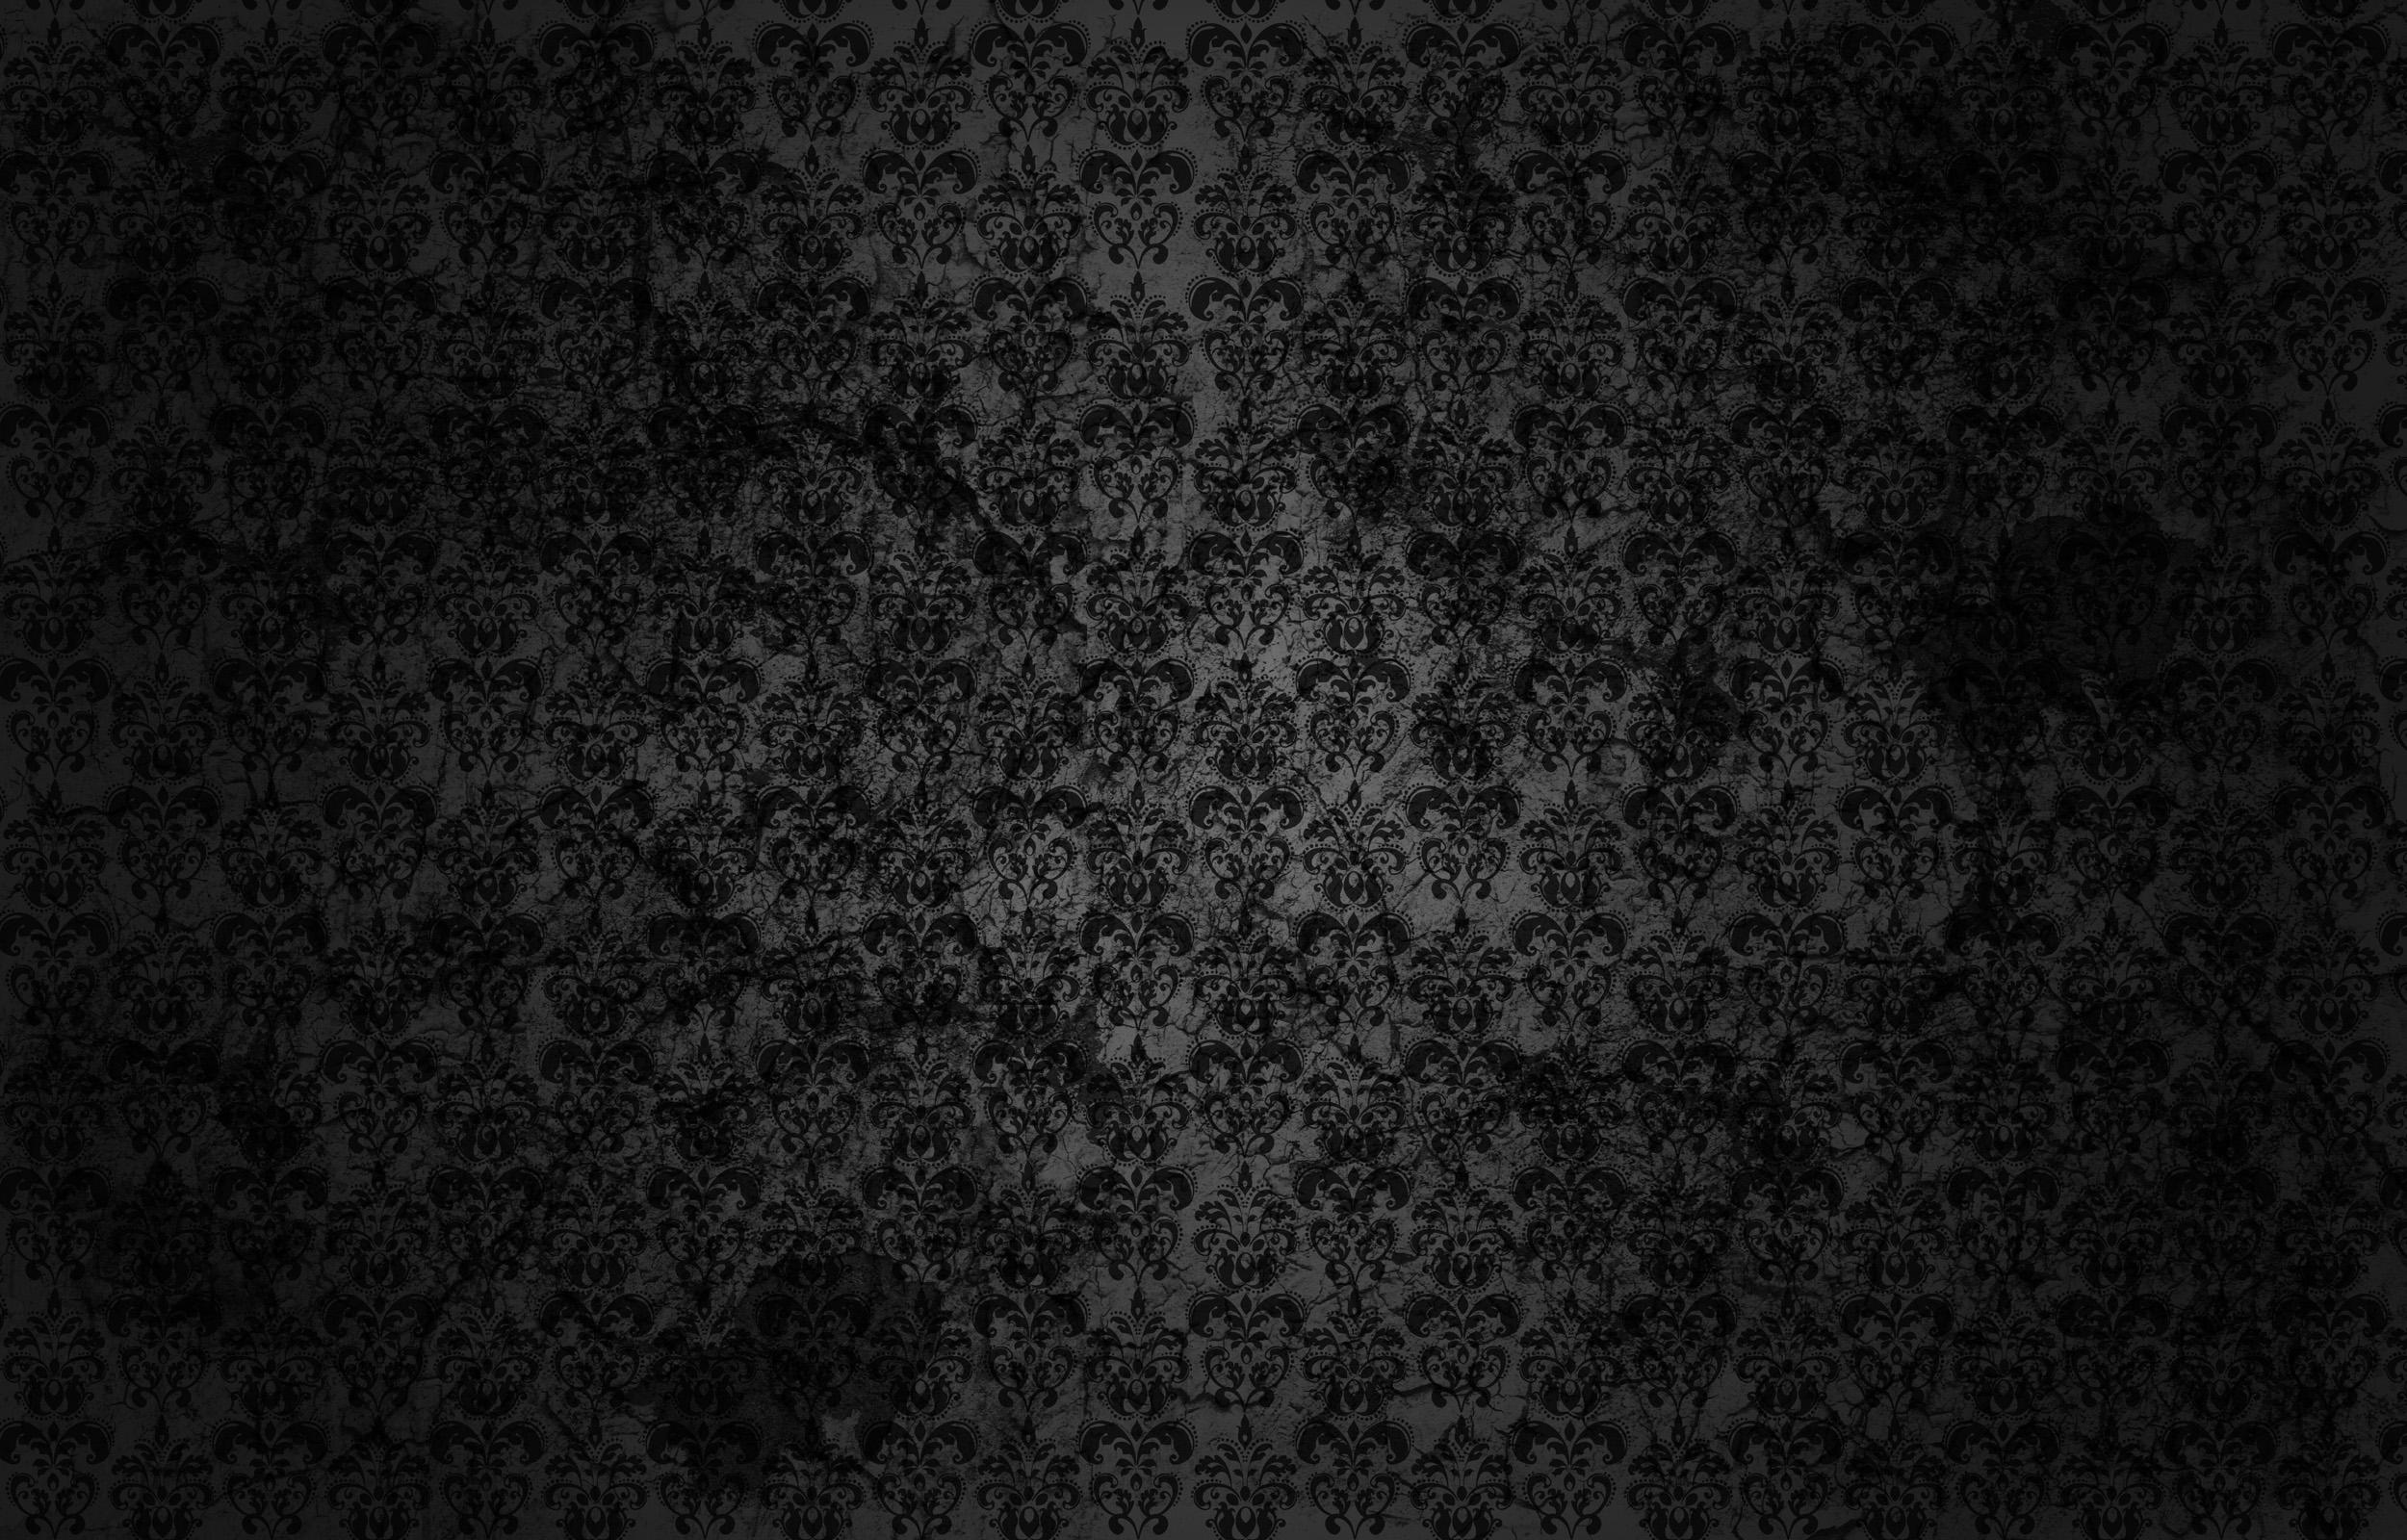 Black Flowers Wall Design 9 Desktop Background